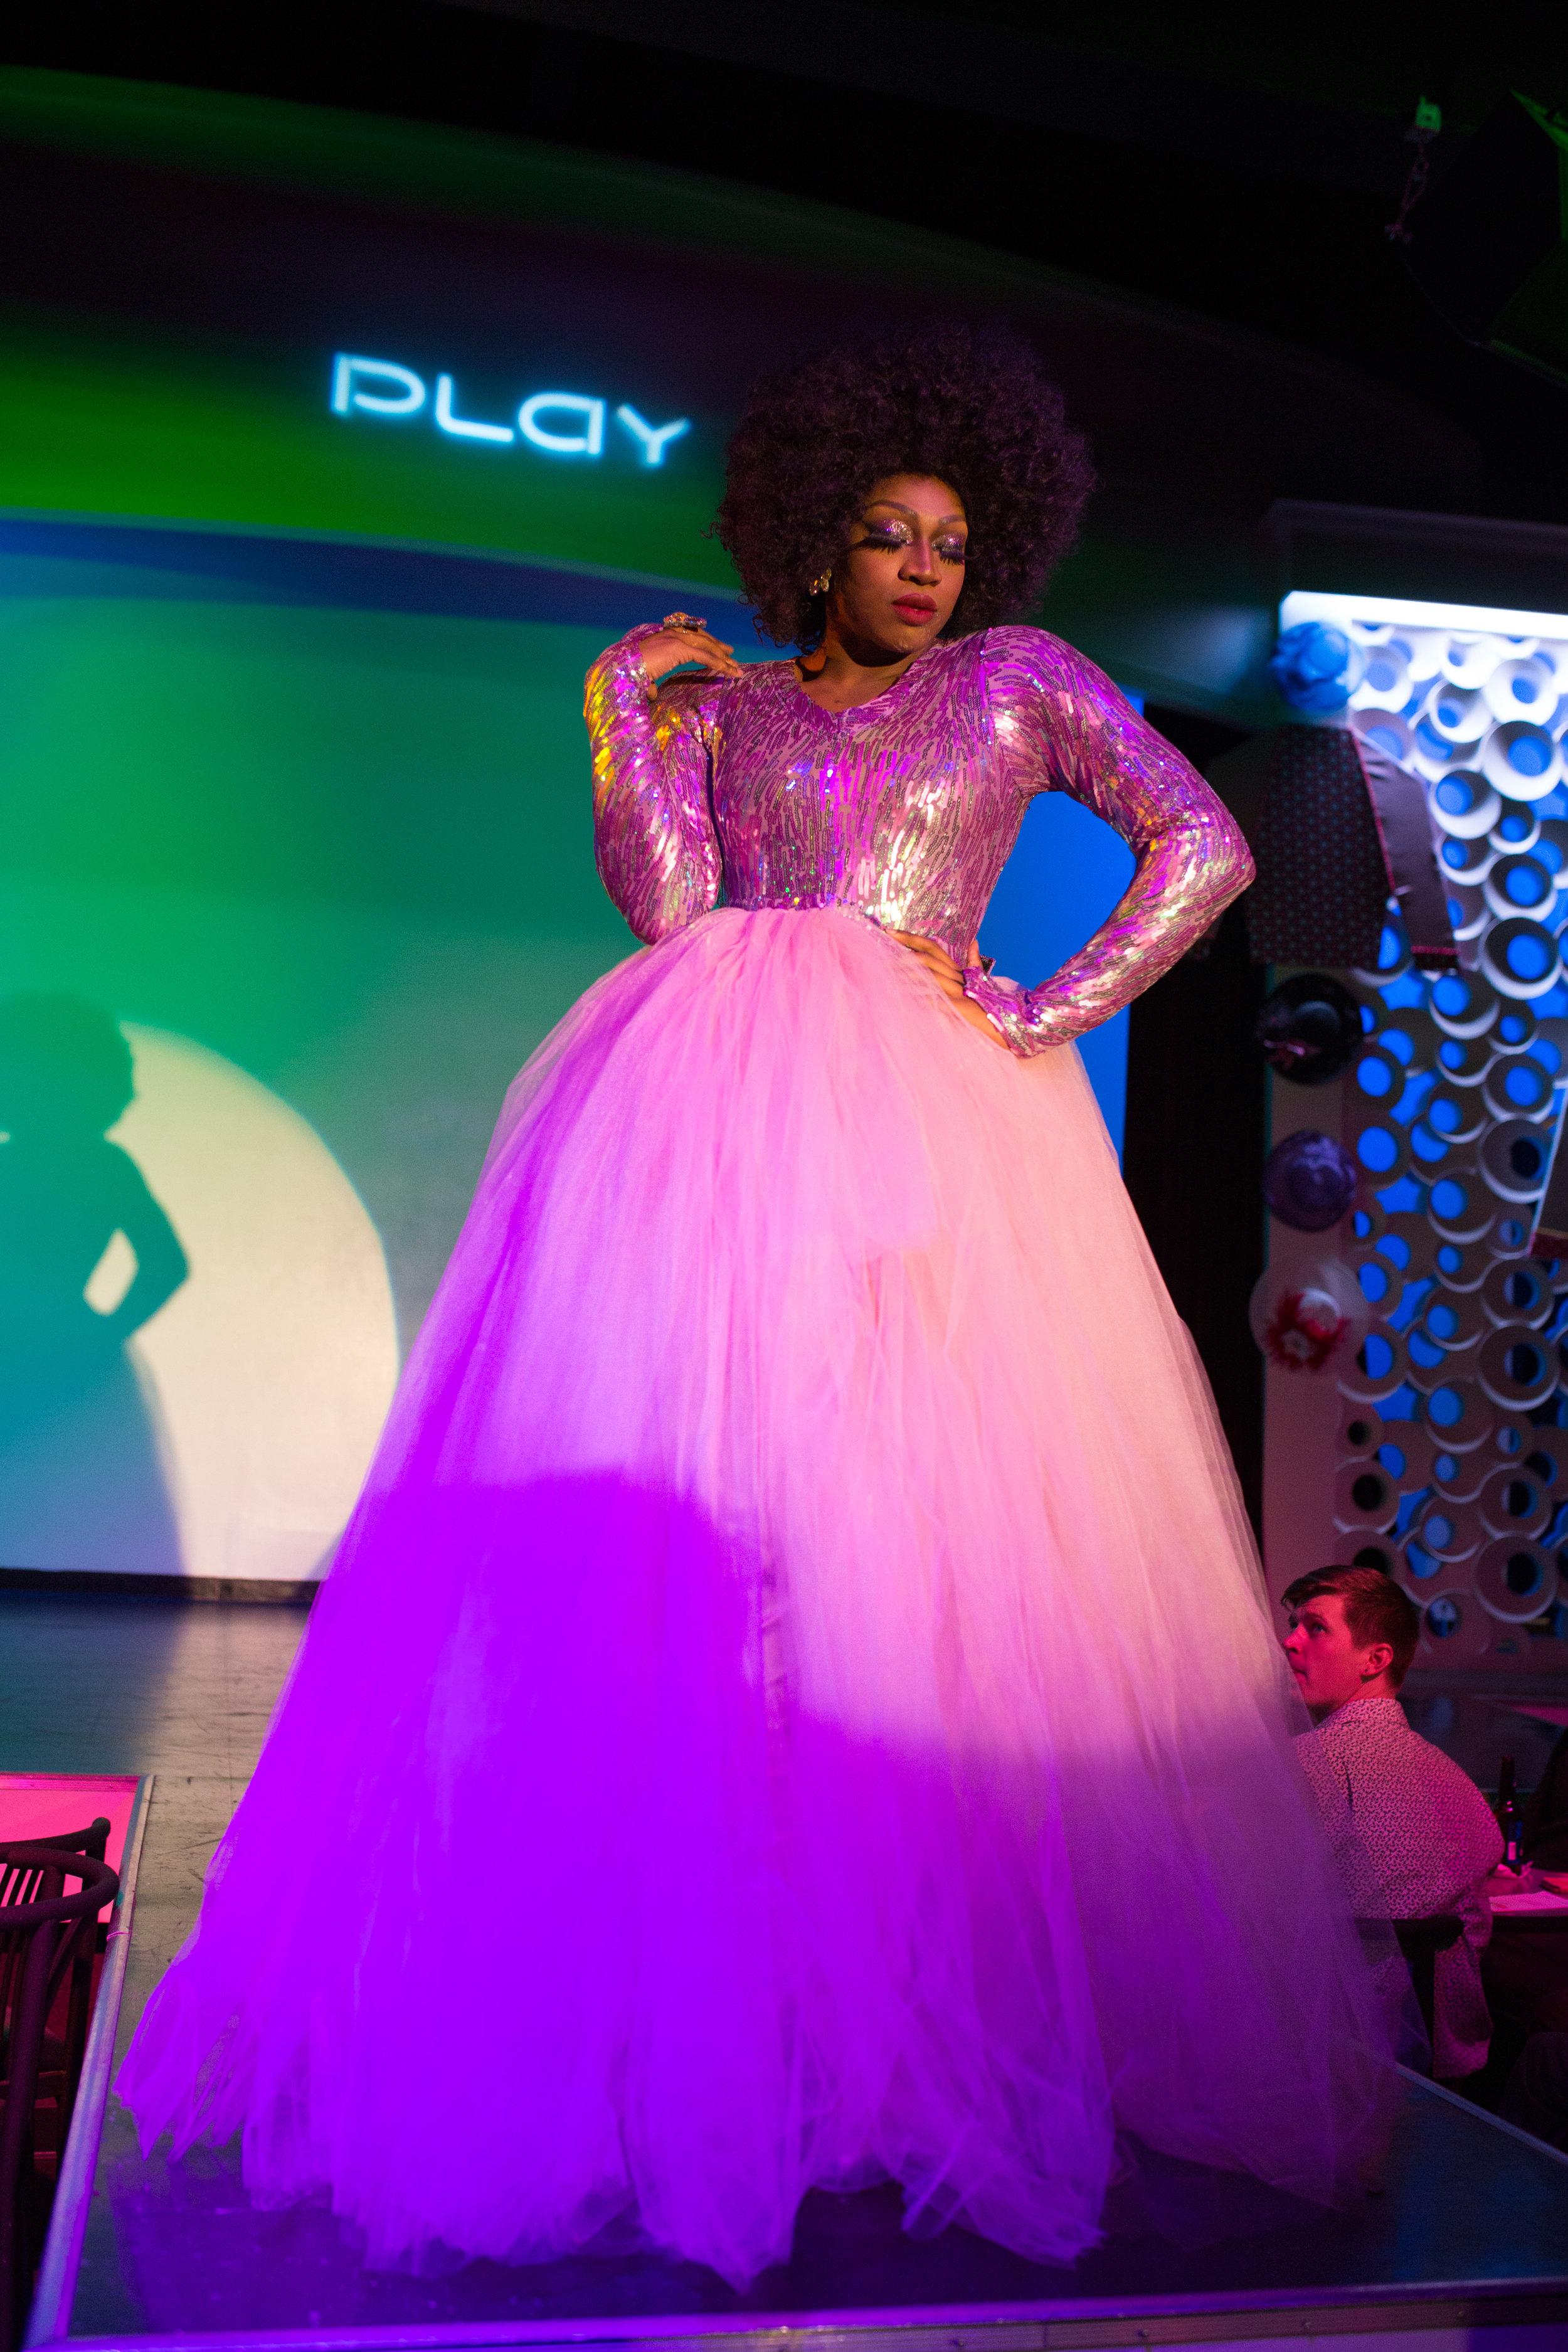 Rainbows & Roses Thurby 2017 WEBSITE FEVA PLAY Crystal Ludwick Photo 52.jpg